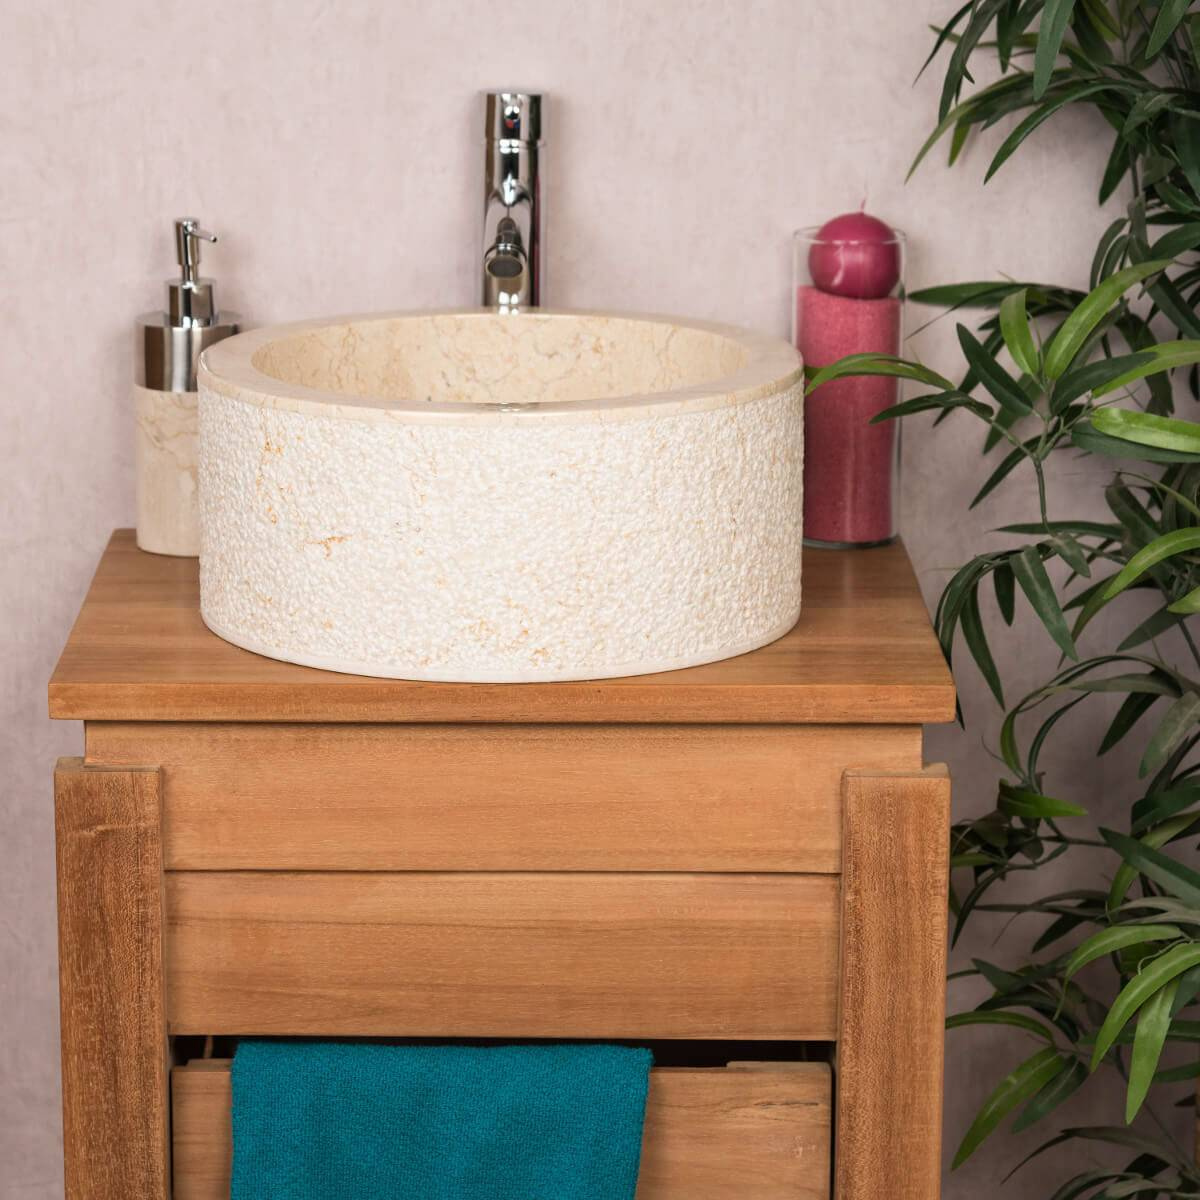 Wanda Collection Vasque lave main à poser de salle de bain en marbre ELBE crème 35